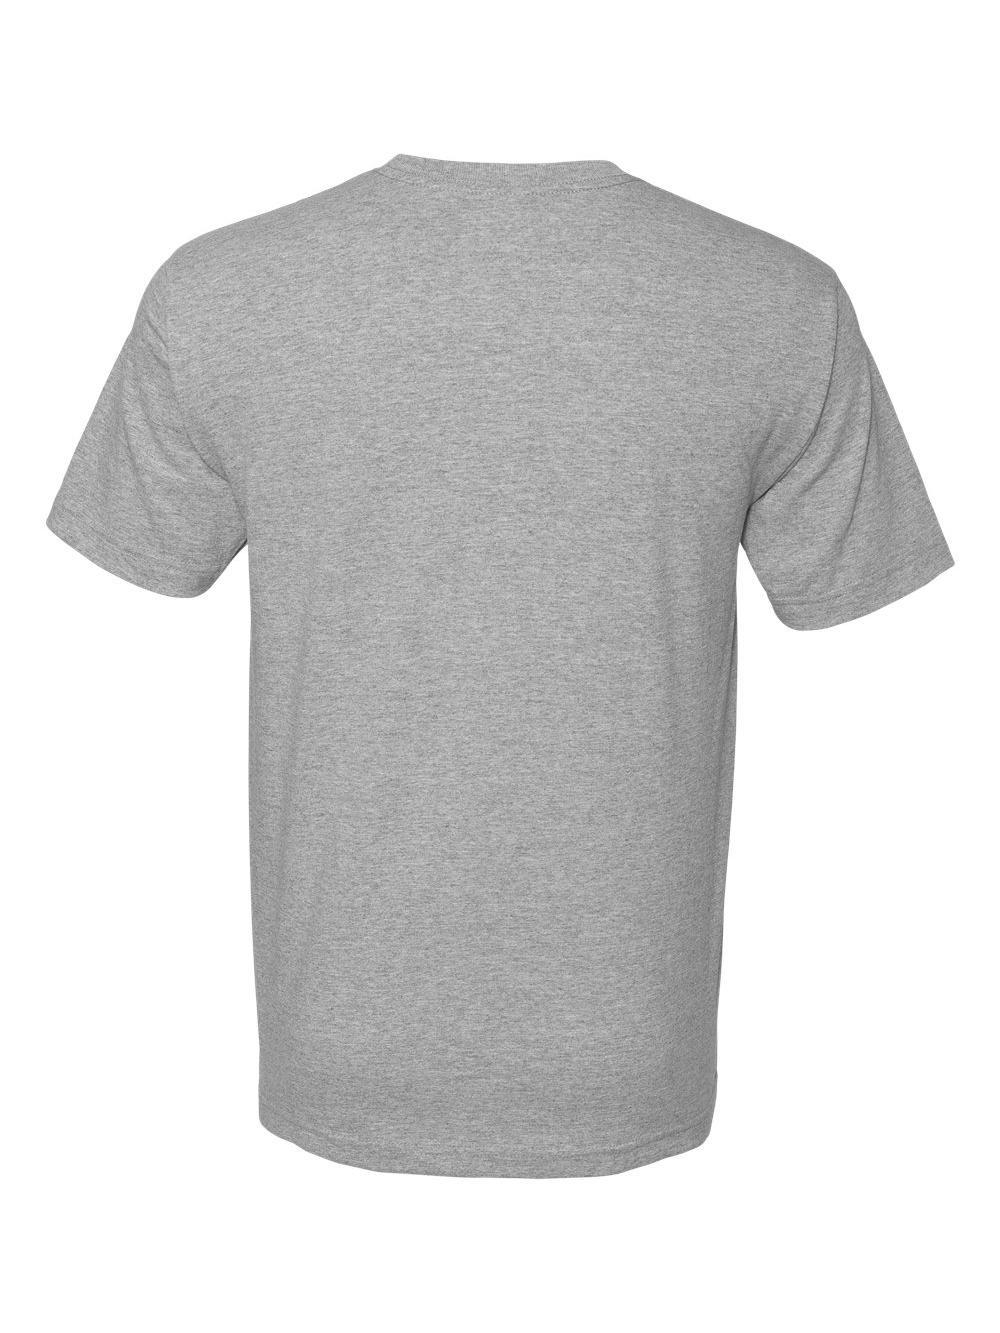 Bayside-USA-Made-100-Cotton-Short-Sleeve-T-Shirt-5040 thumbnail 13